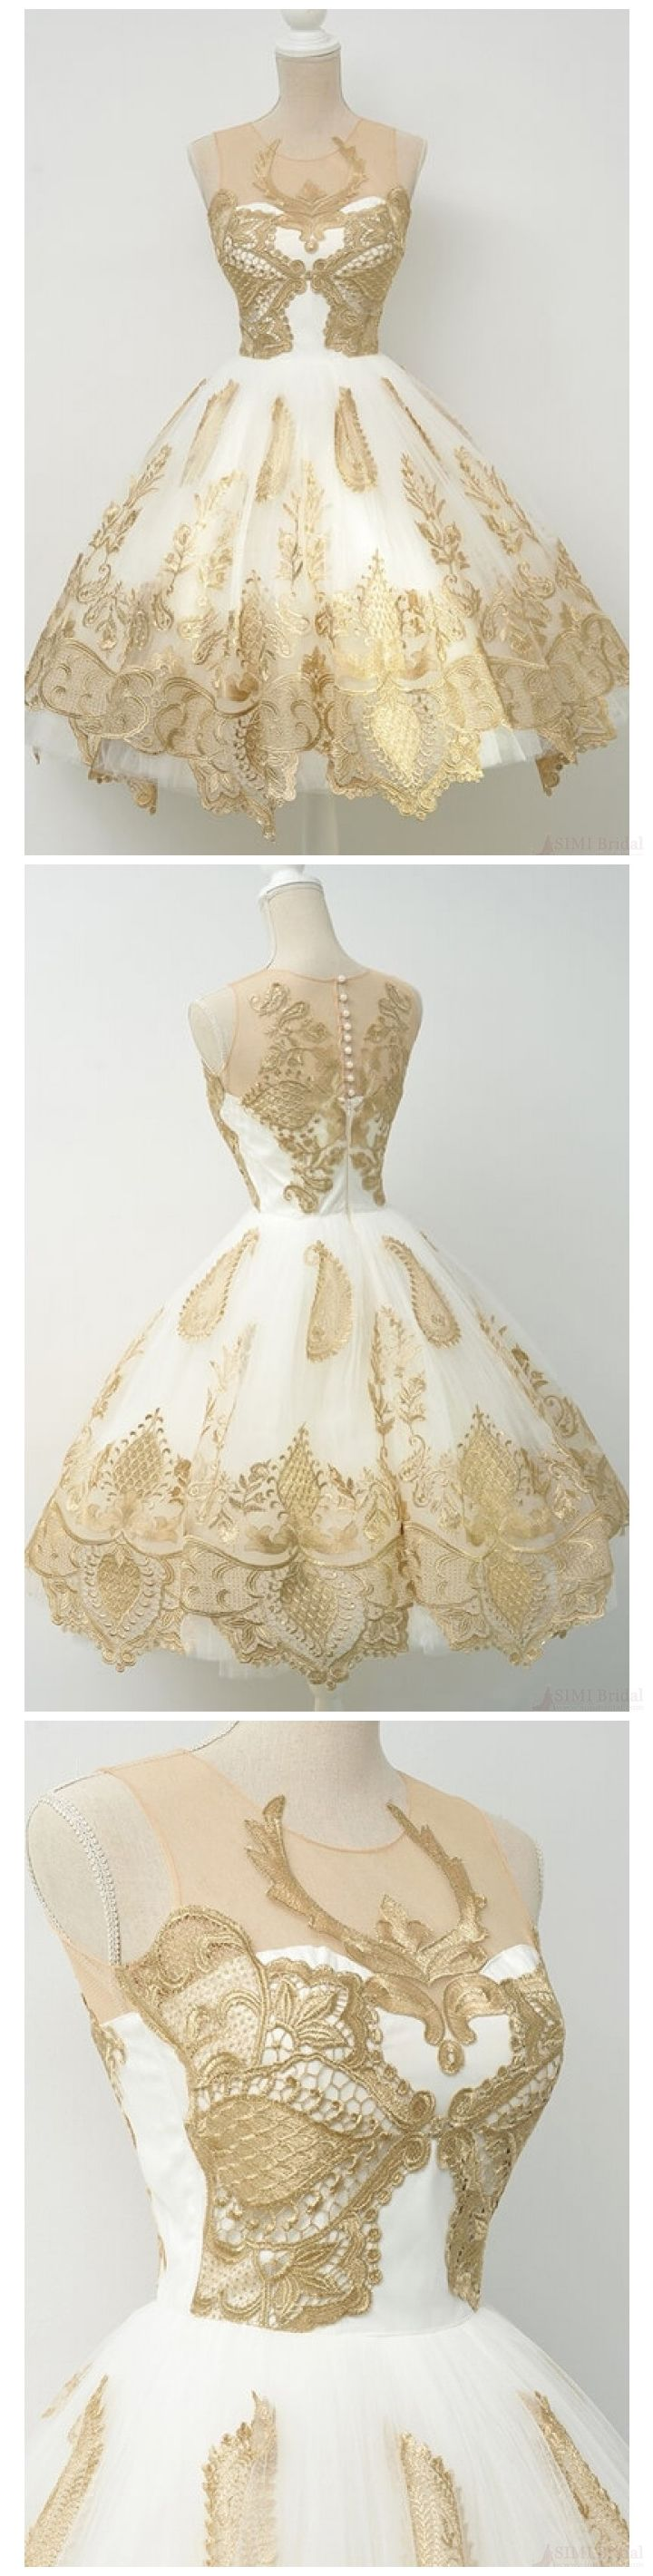 Gold lace homecoming dresses knee length vintage short prom dresses